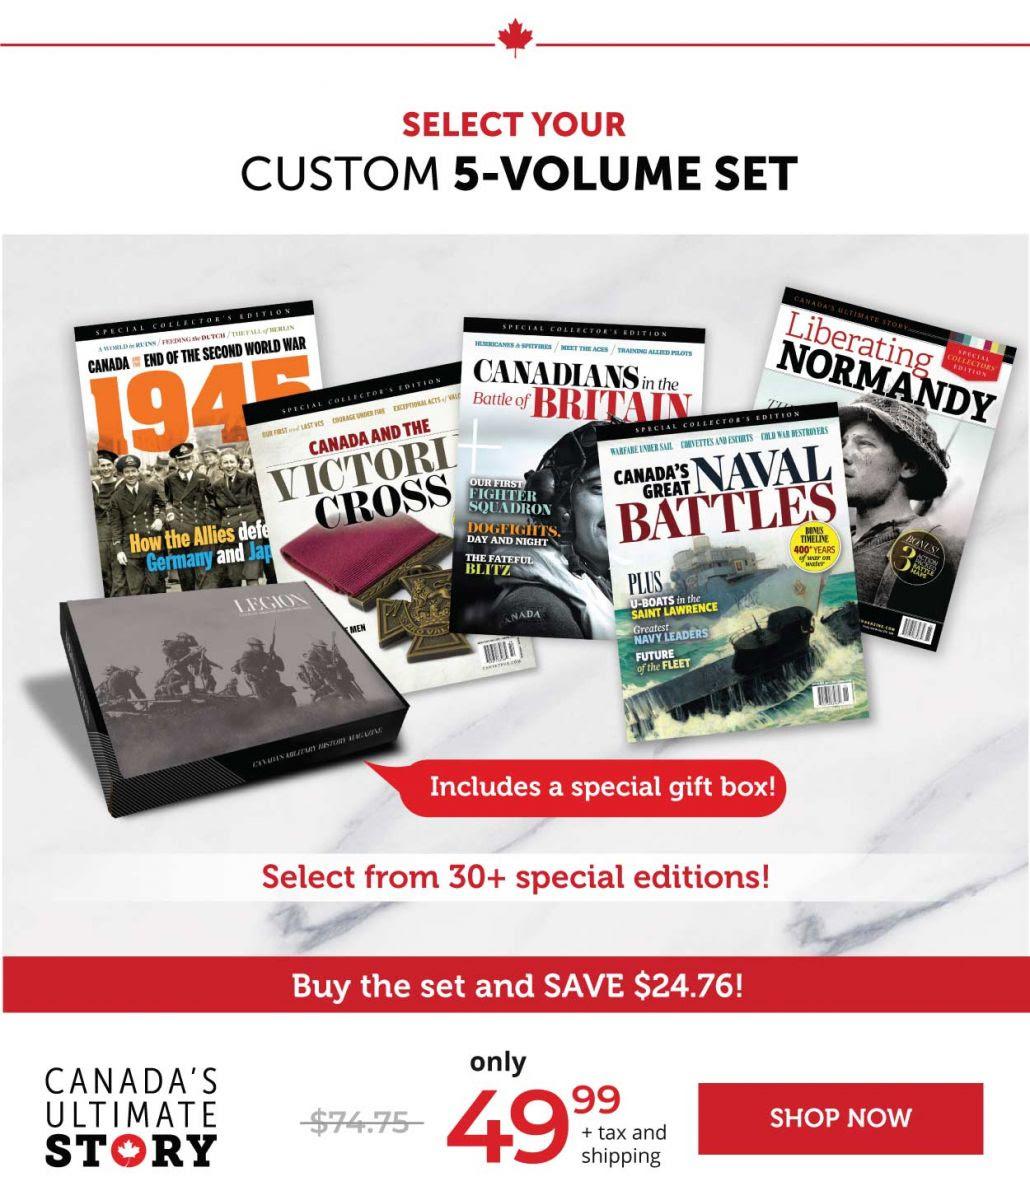 Custom 5 Volume Set